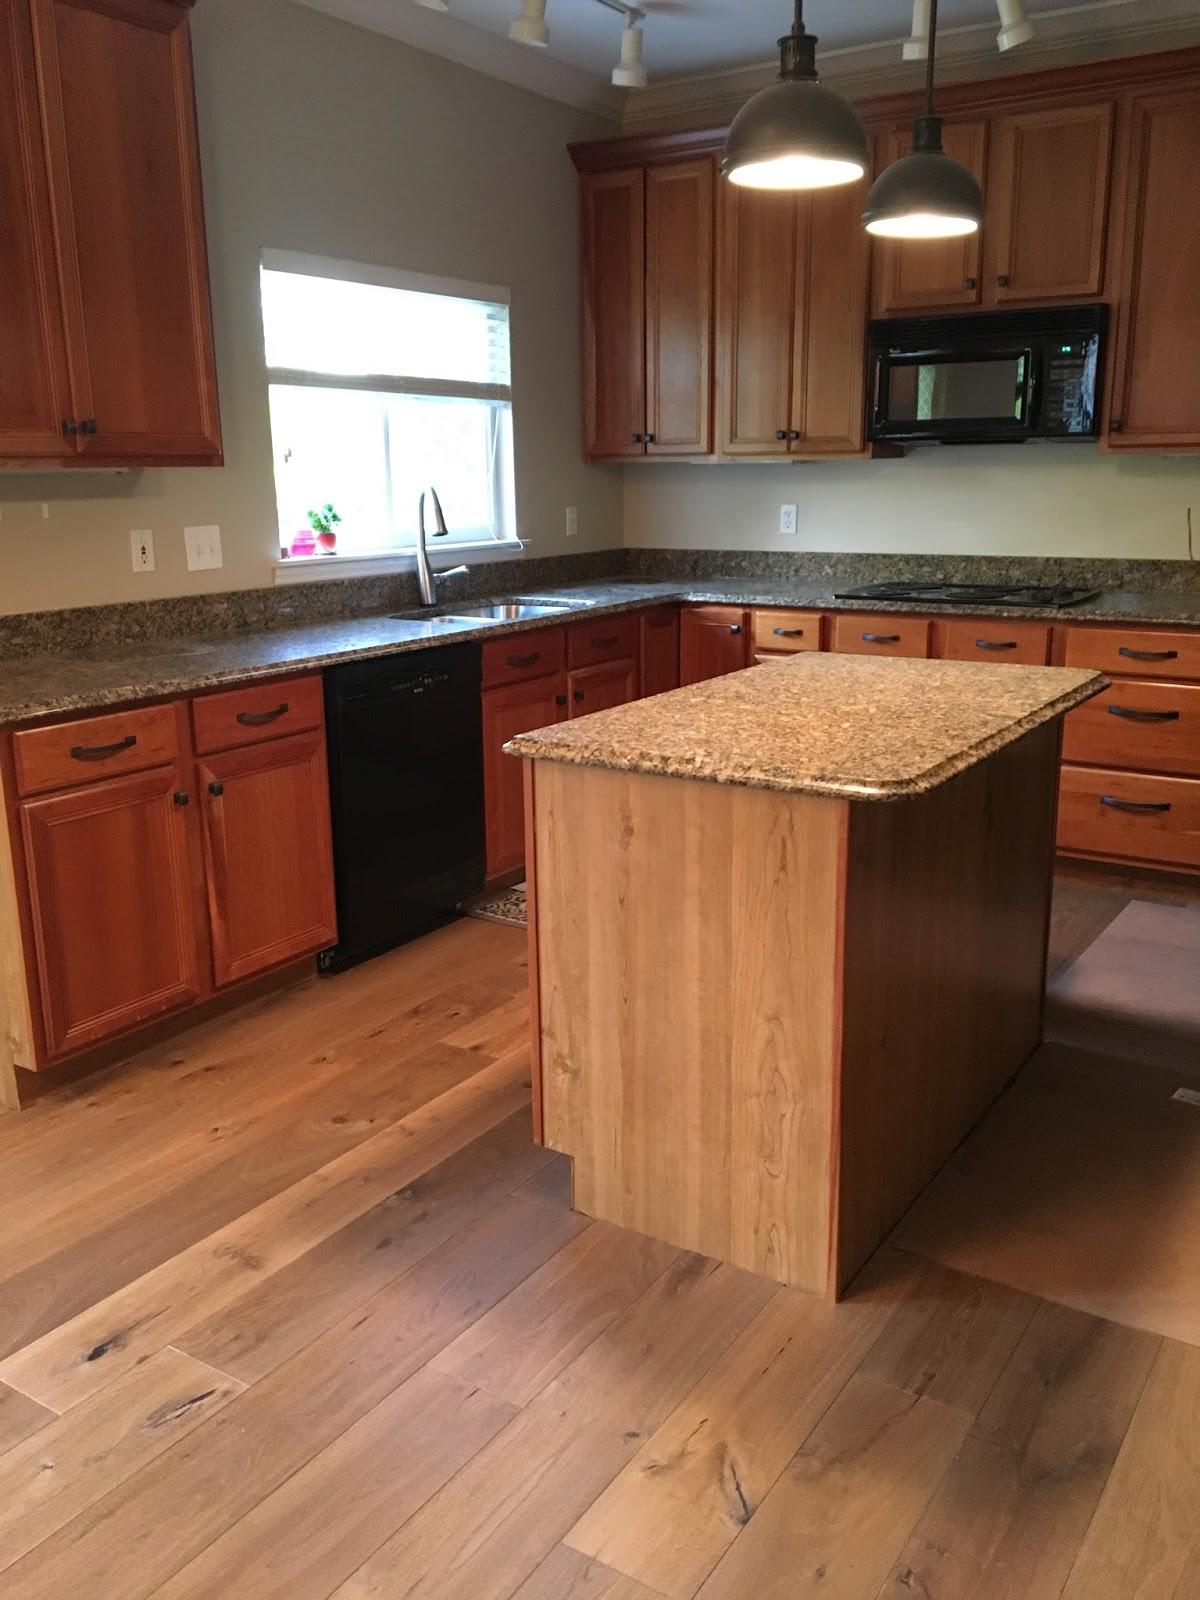 Full Height Granite Backsplash Kitchen